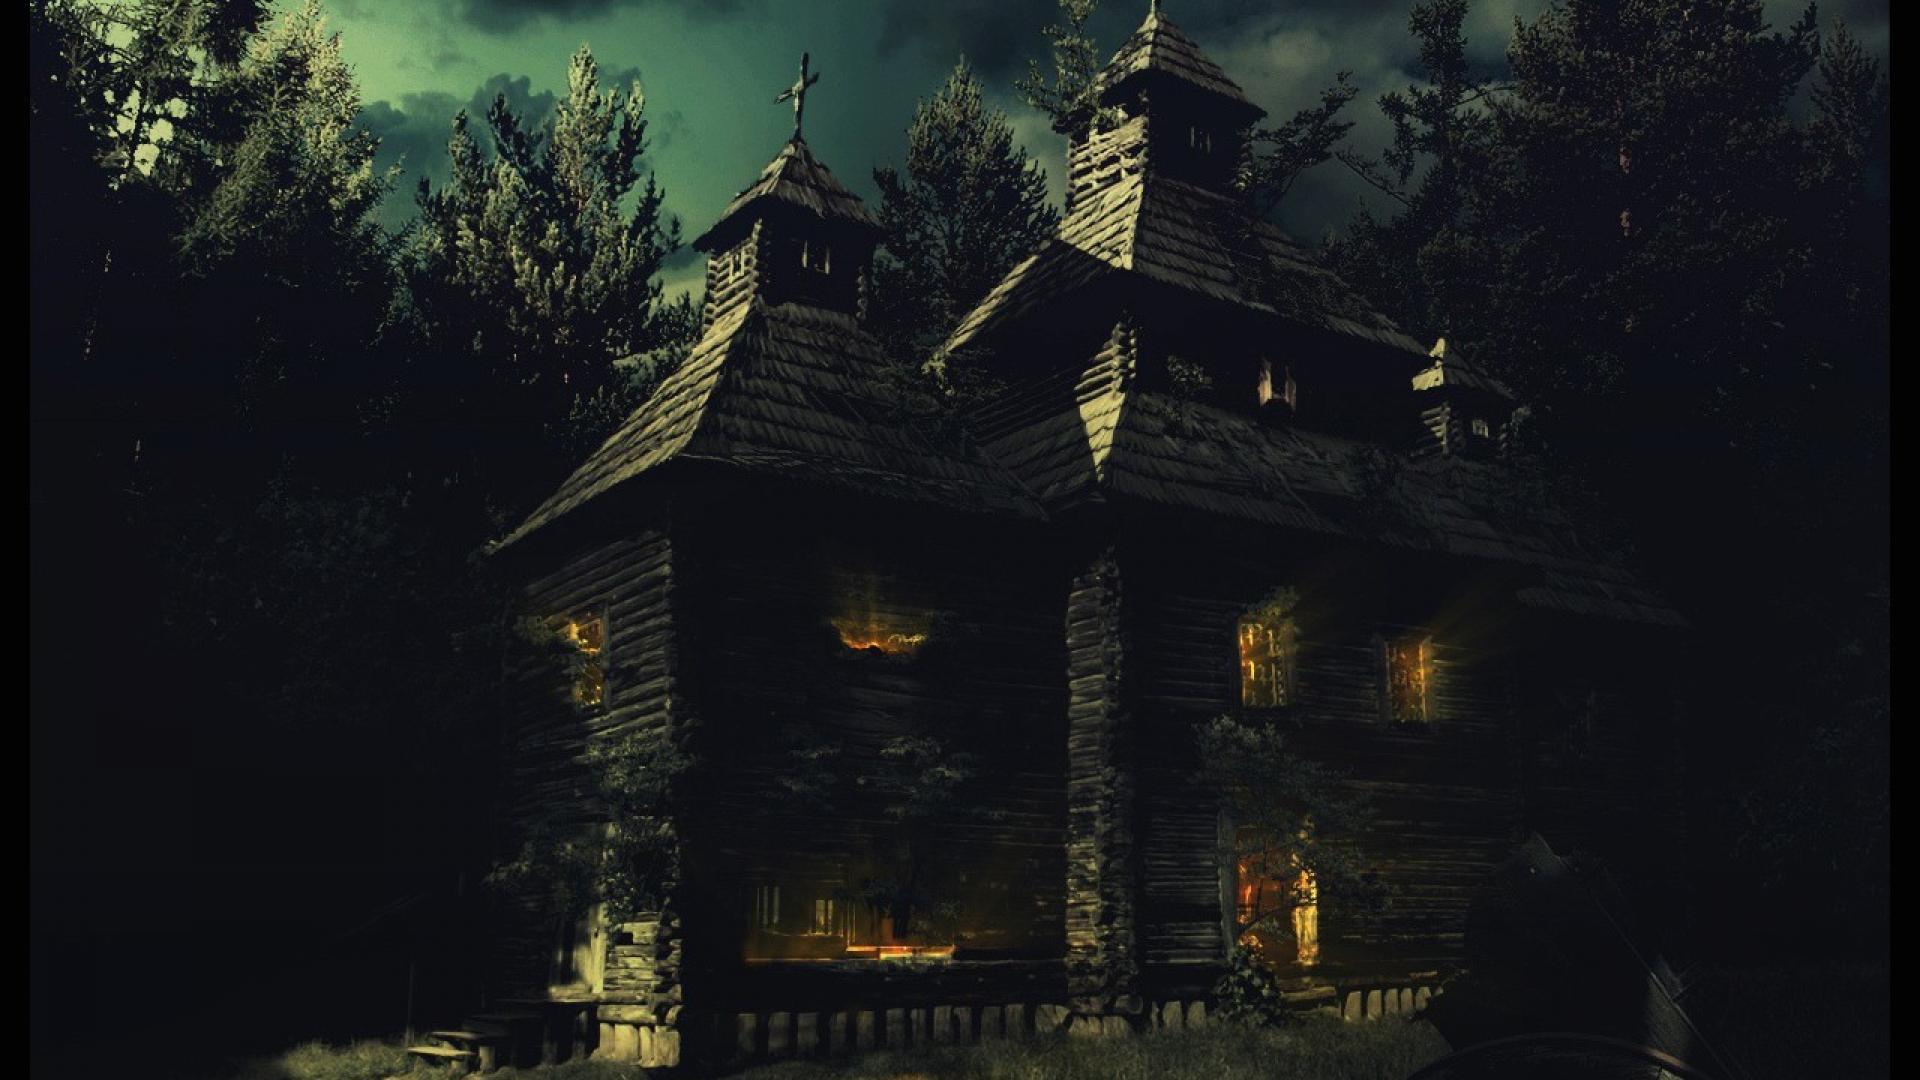 Fantasy art artwork haunted house wallpaper 21712 1920x1080